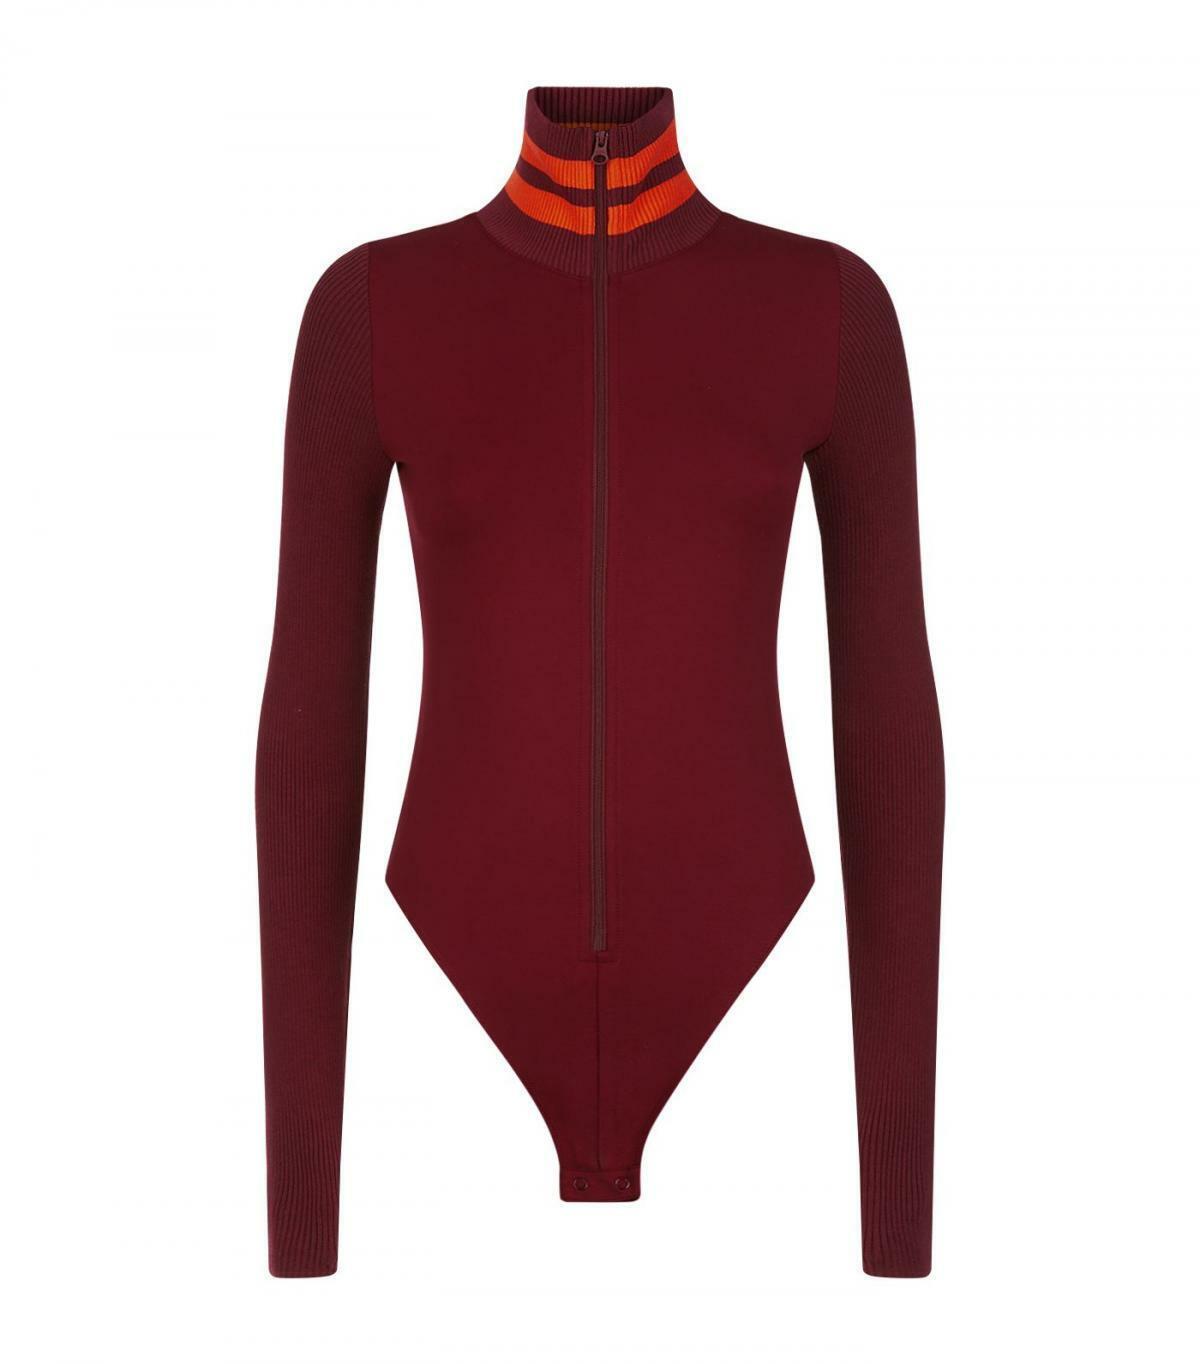 Puma x Fenty by Rihanna Womens Longsleeve Burgundy Bodysuit Full Zip US XS S M